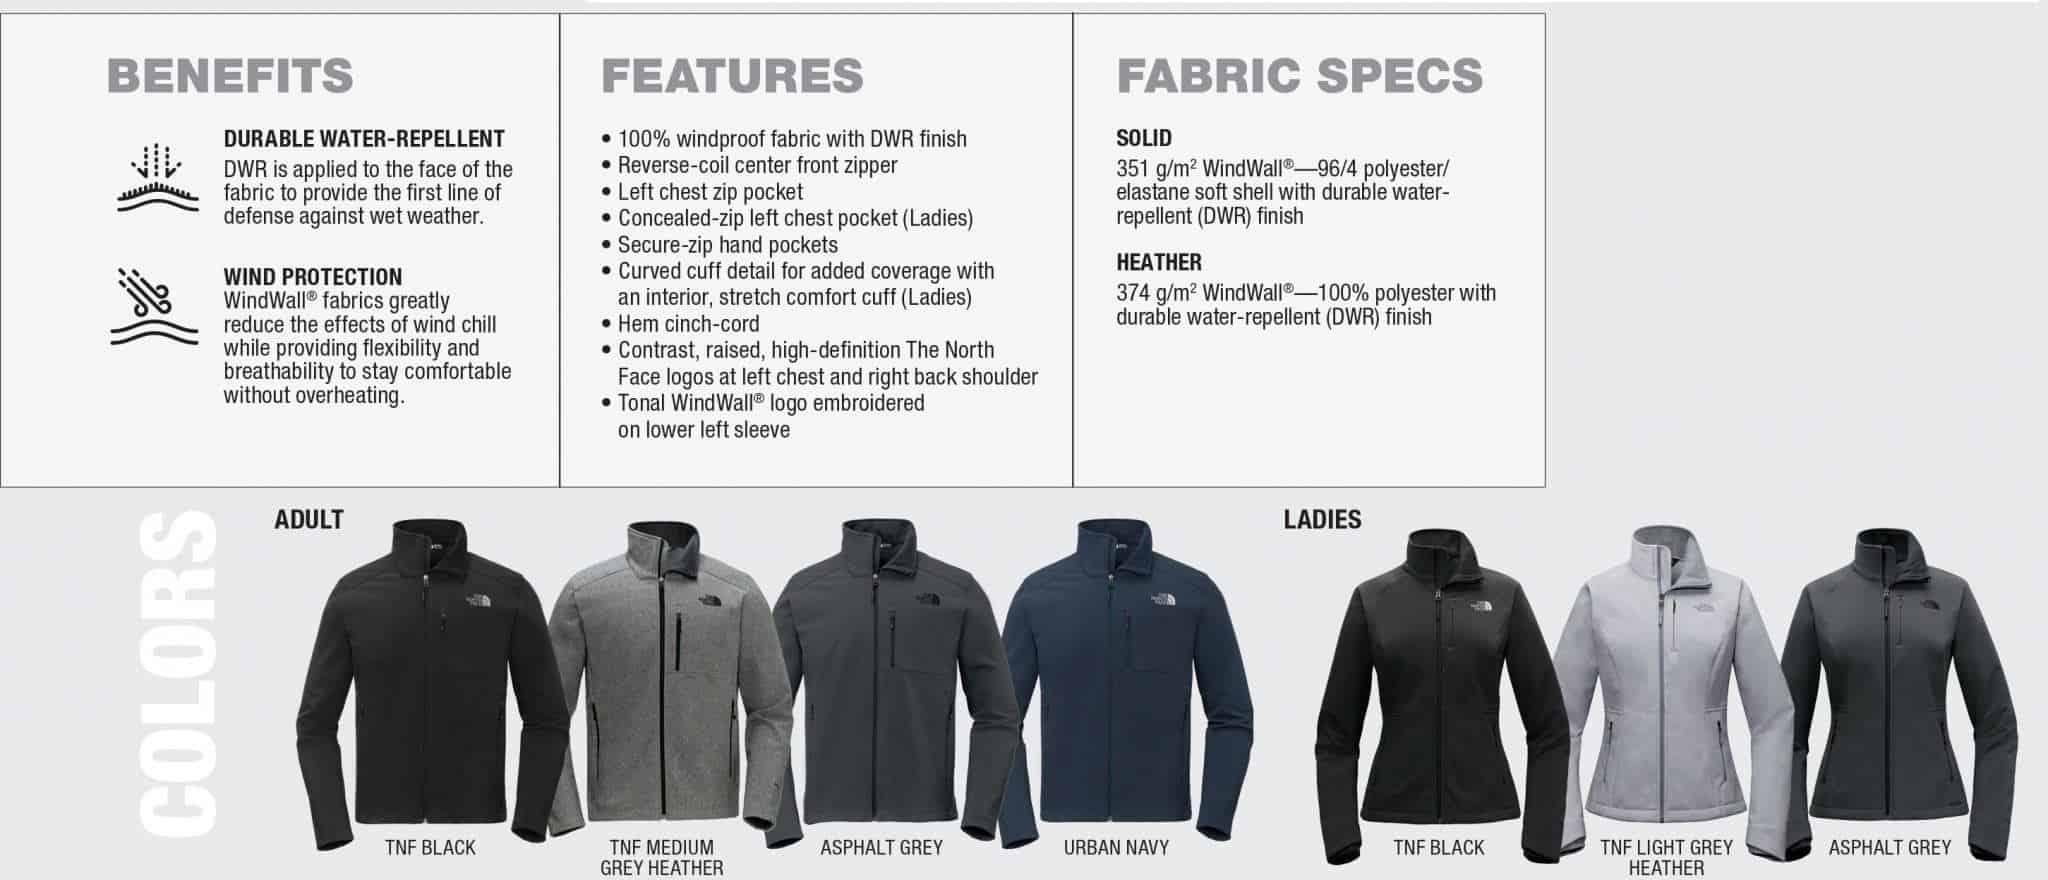 891610fa988b Custom North Face Jackets – WindWall Benefits